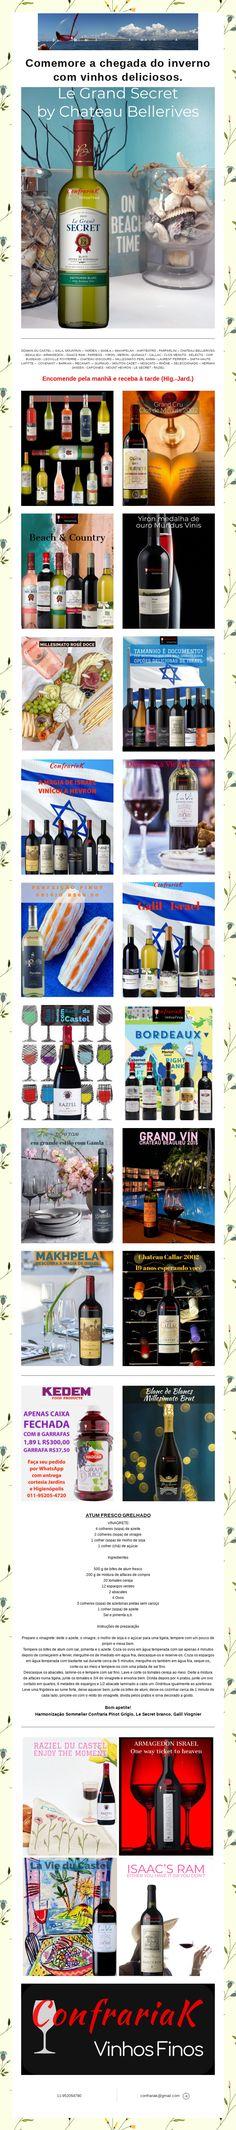 Mouton Cadet, Laurent Perrier, Baseball Cards, Wine Pairings